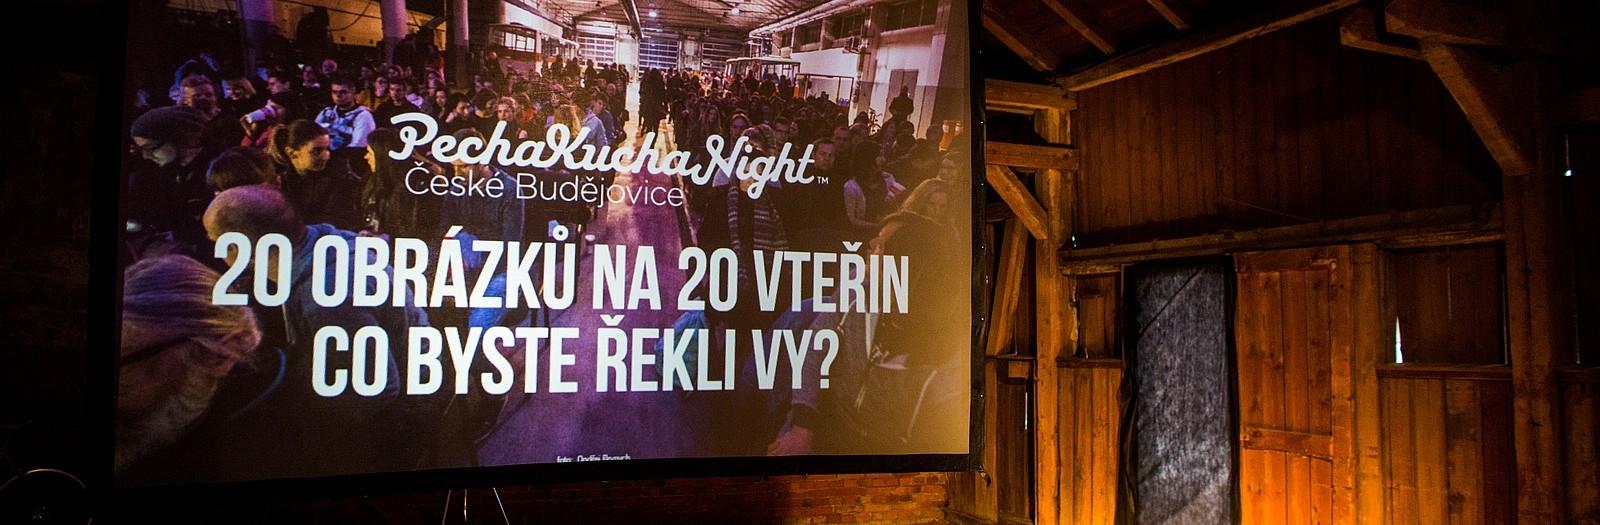 PechaKucha ČB